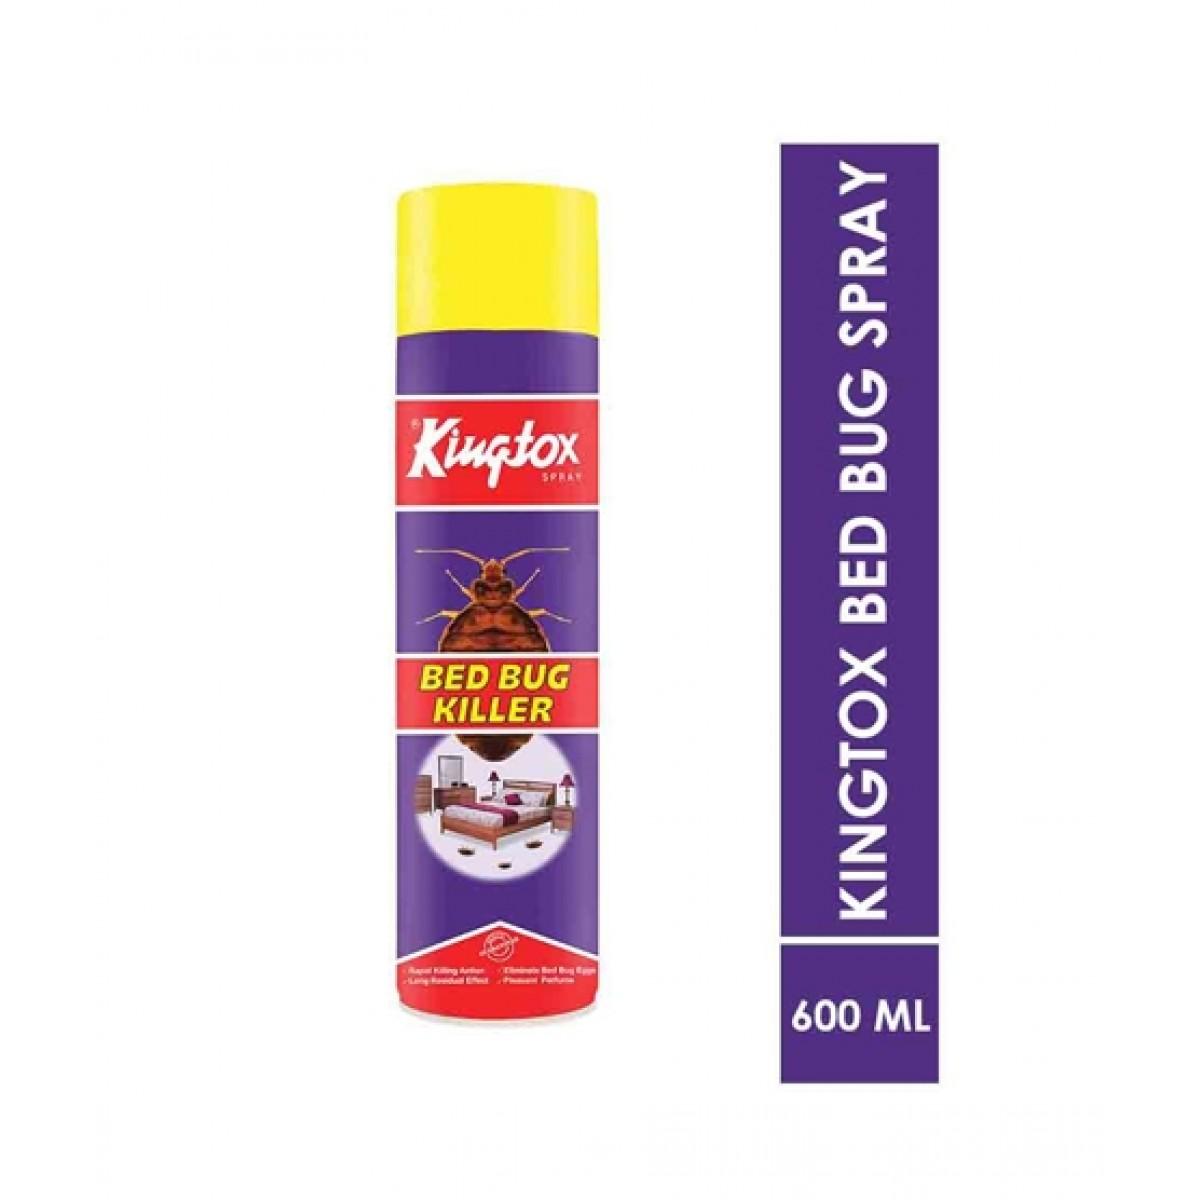 Kingtox Bed Bug Killer Price In Pakistan Buy Kingtox Bed Bug Killer Spray 600ml Ishopping Pk